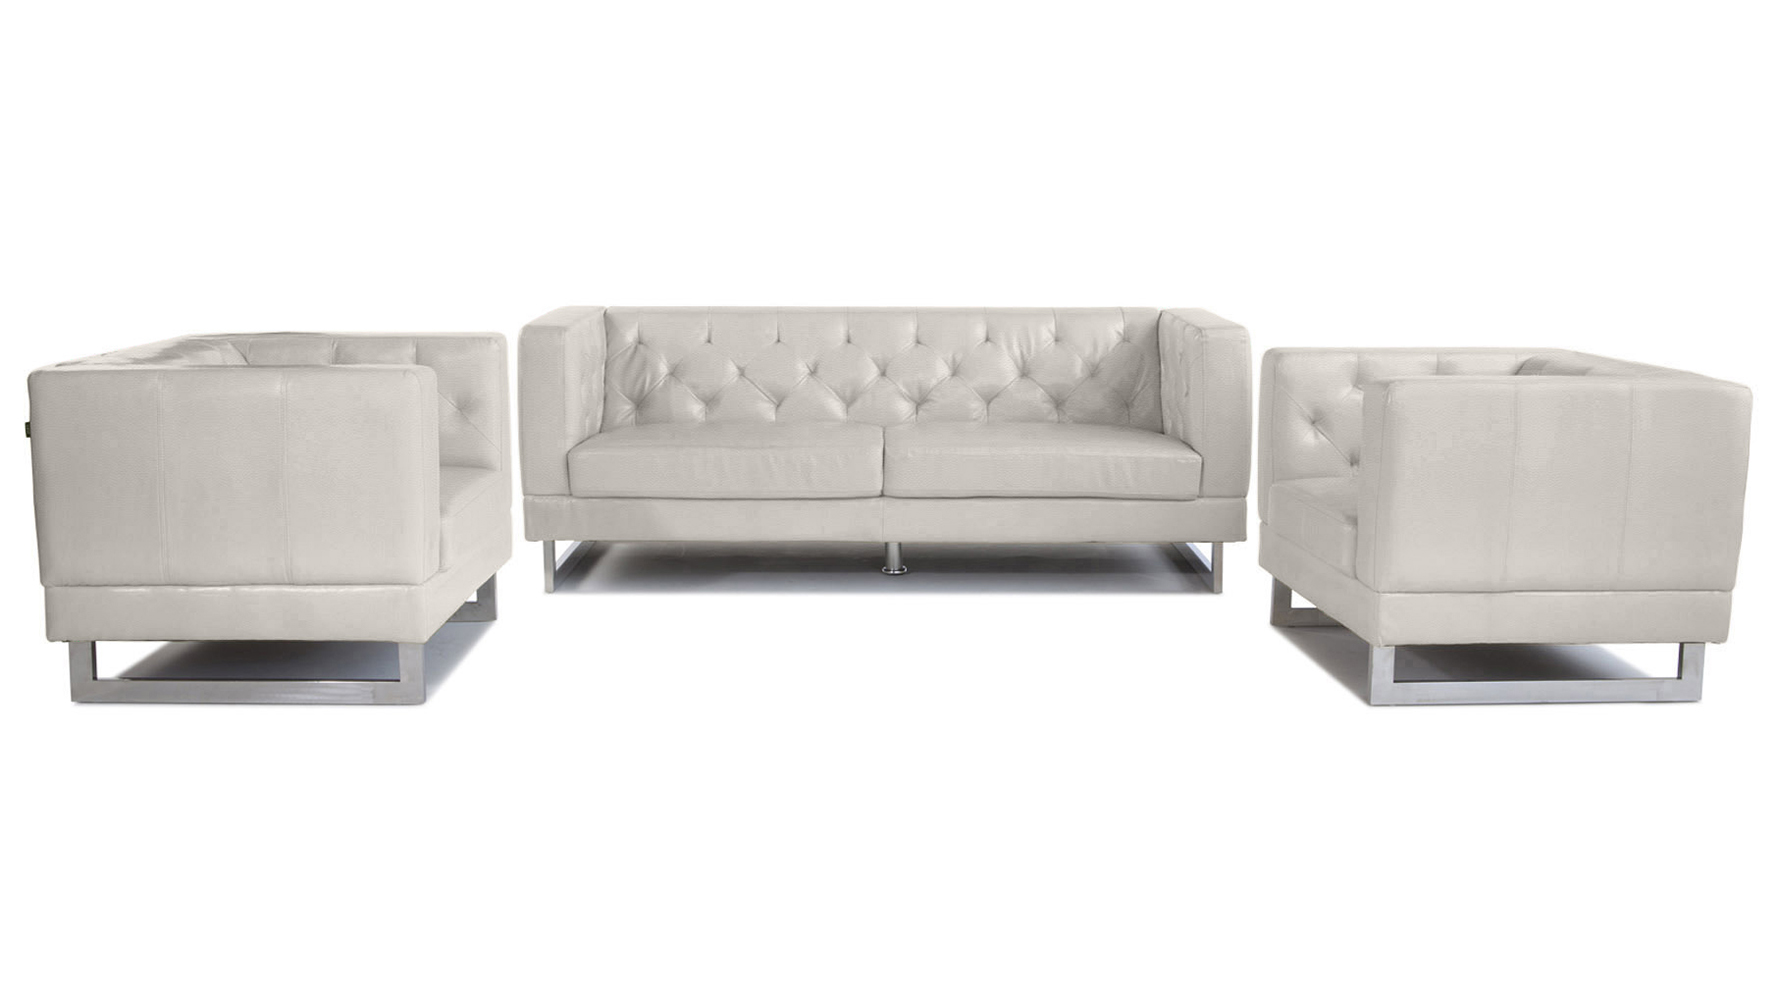 Brilliant Zeta Sofa Set With 2 Armchairs Beige Cjindustries Chair Design For Home Cjindustriesco